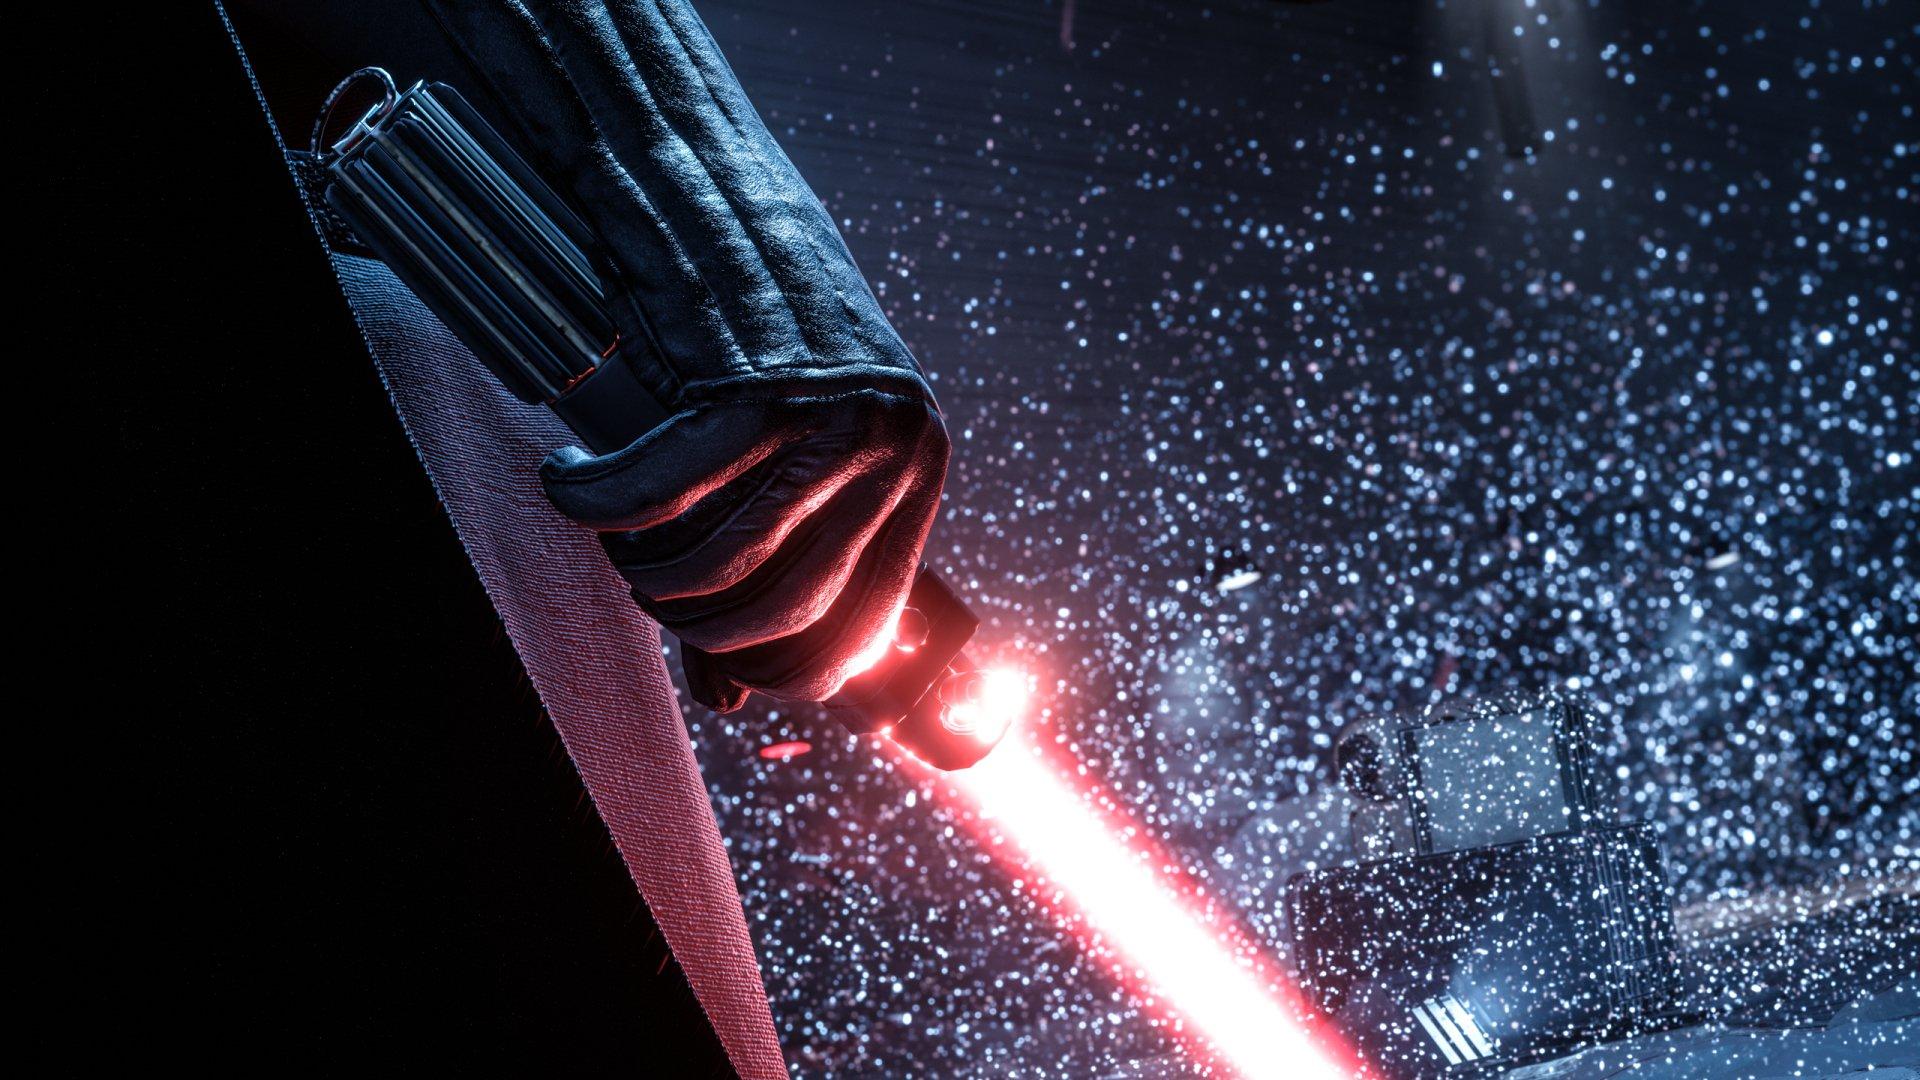 Star Wars Battlefront (2015) HD Wallpaper